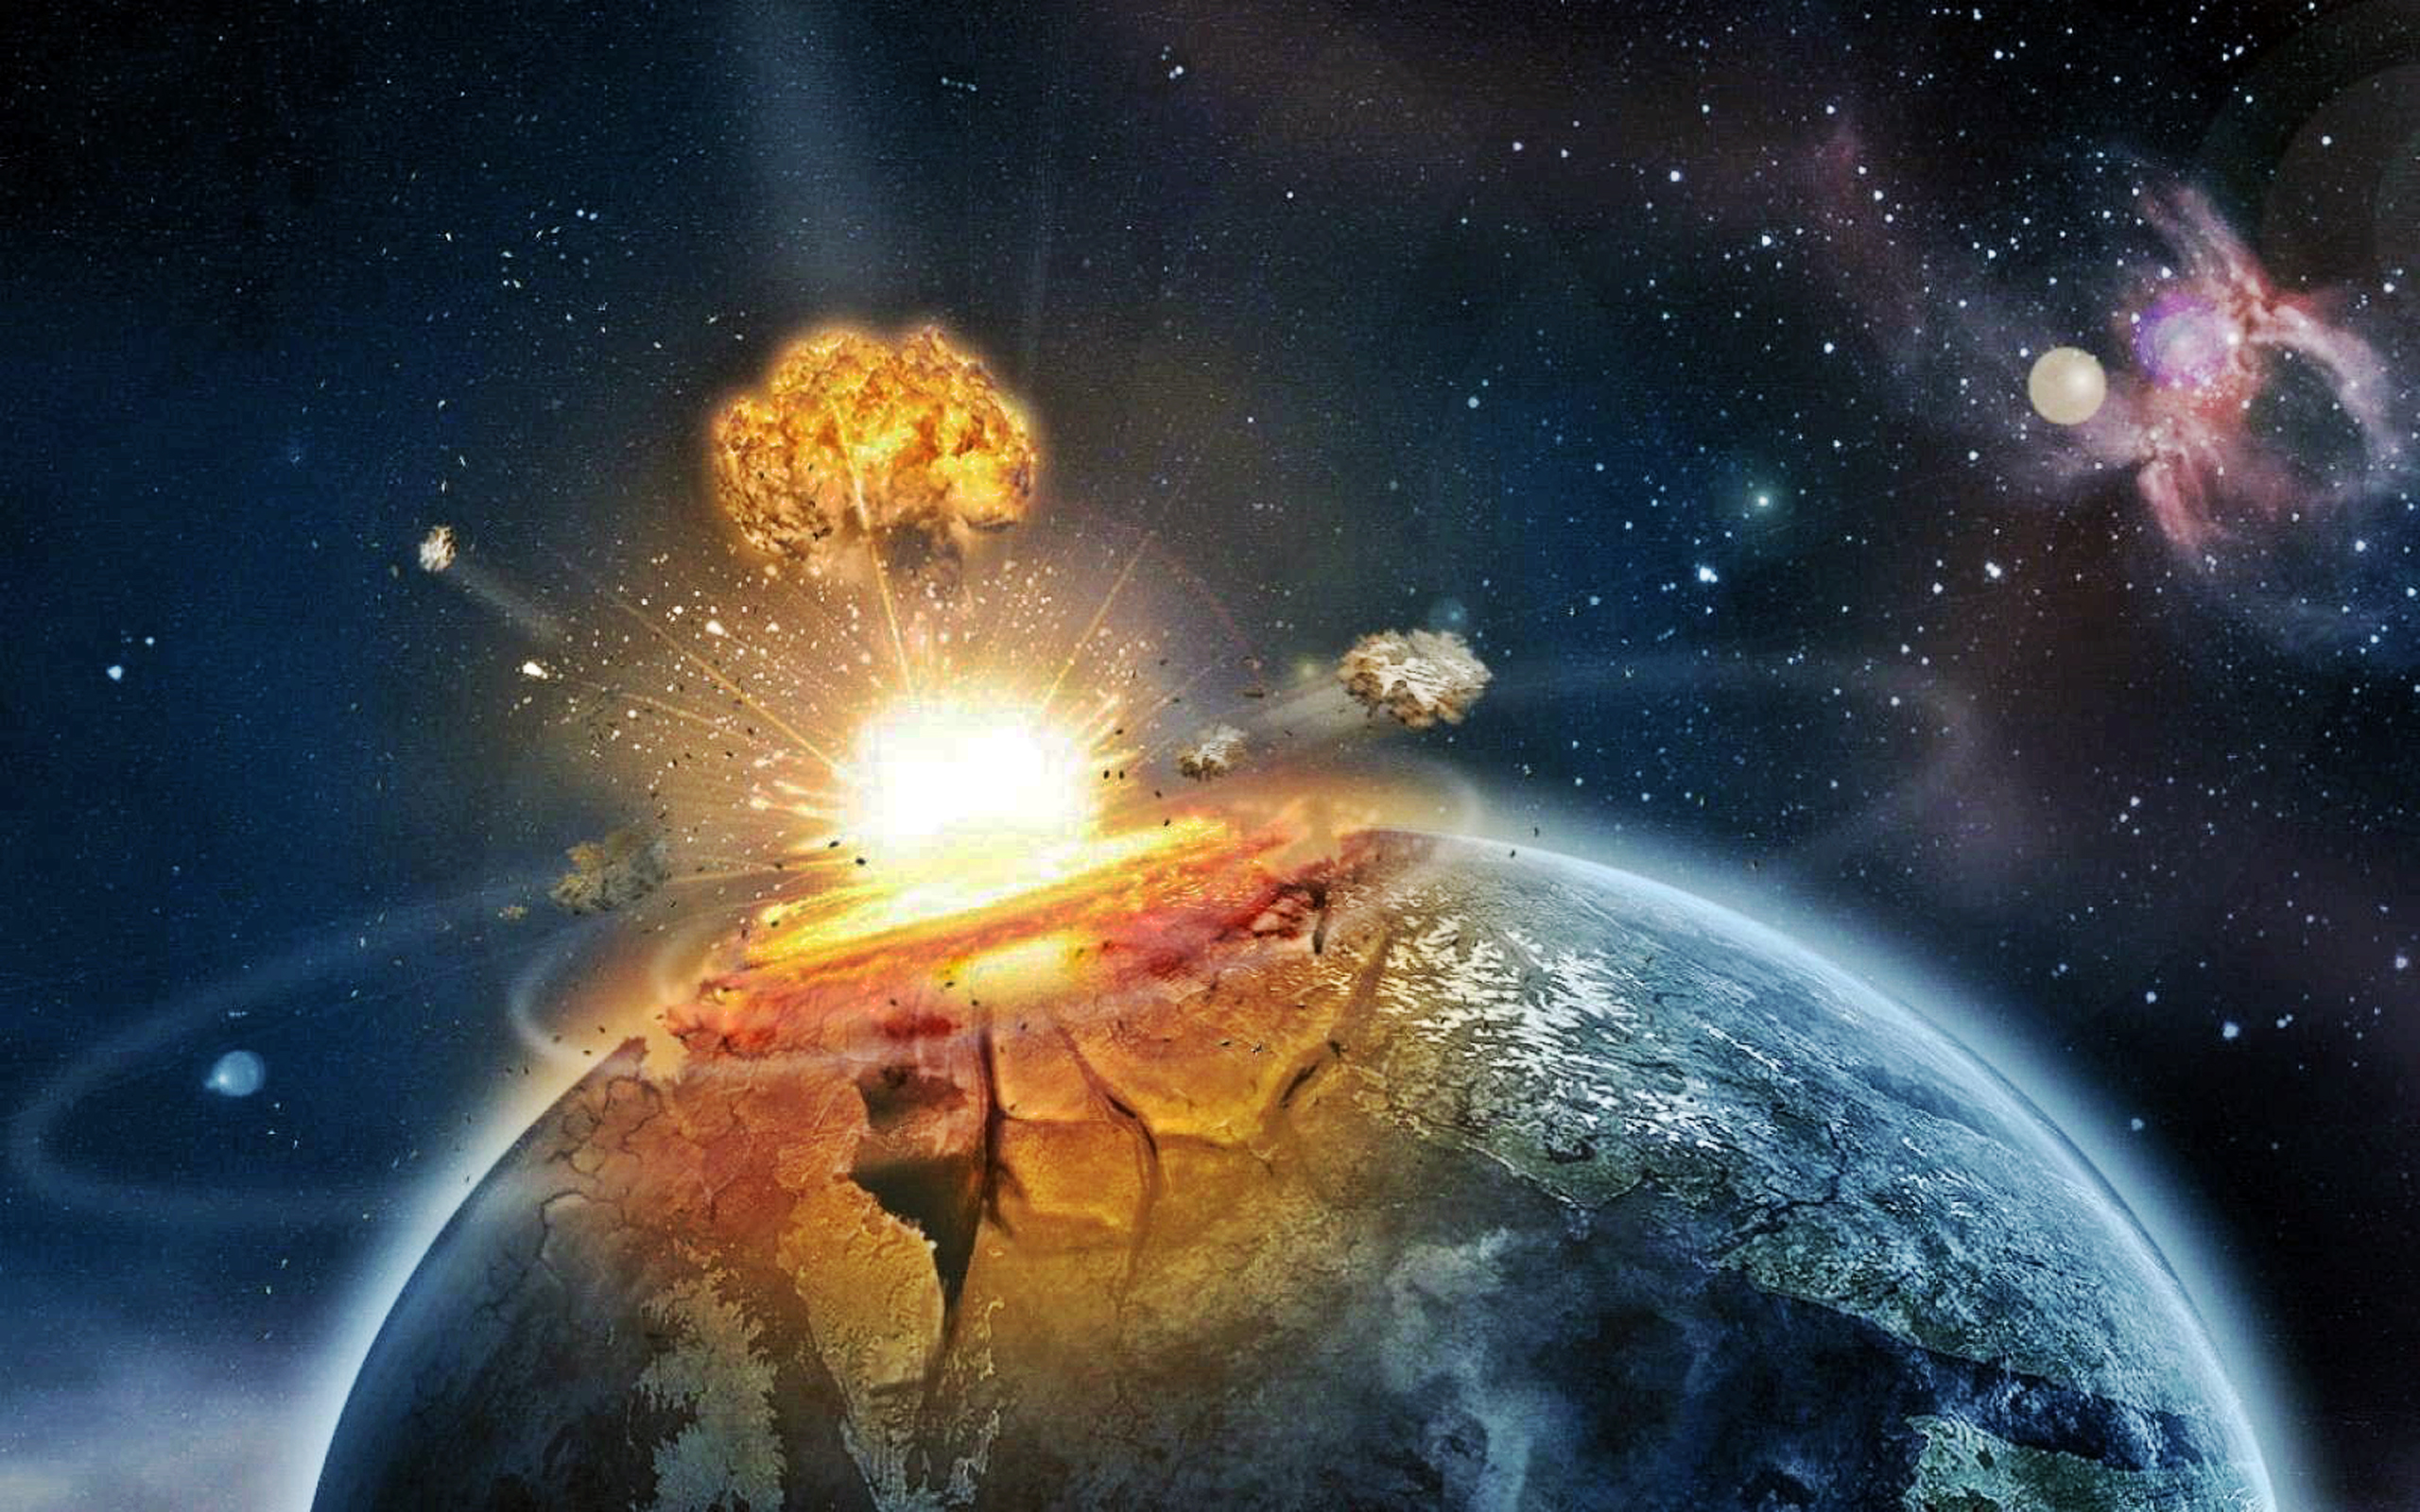 3d Asteroid Wallpaper Wallpaper Apocalypse Asteroid Earth Explosion Meteor